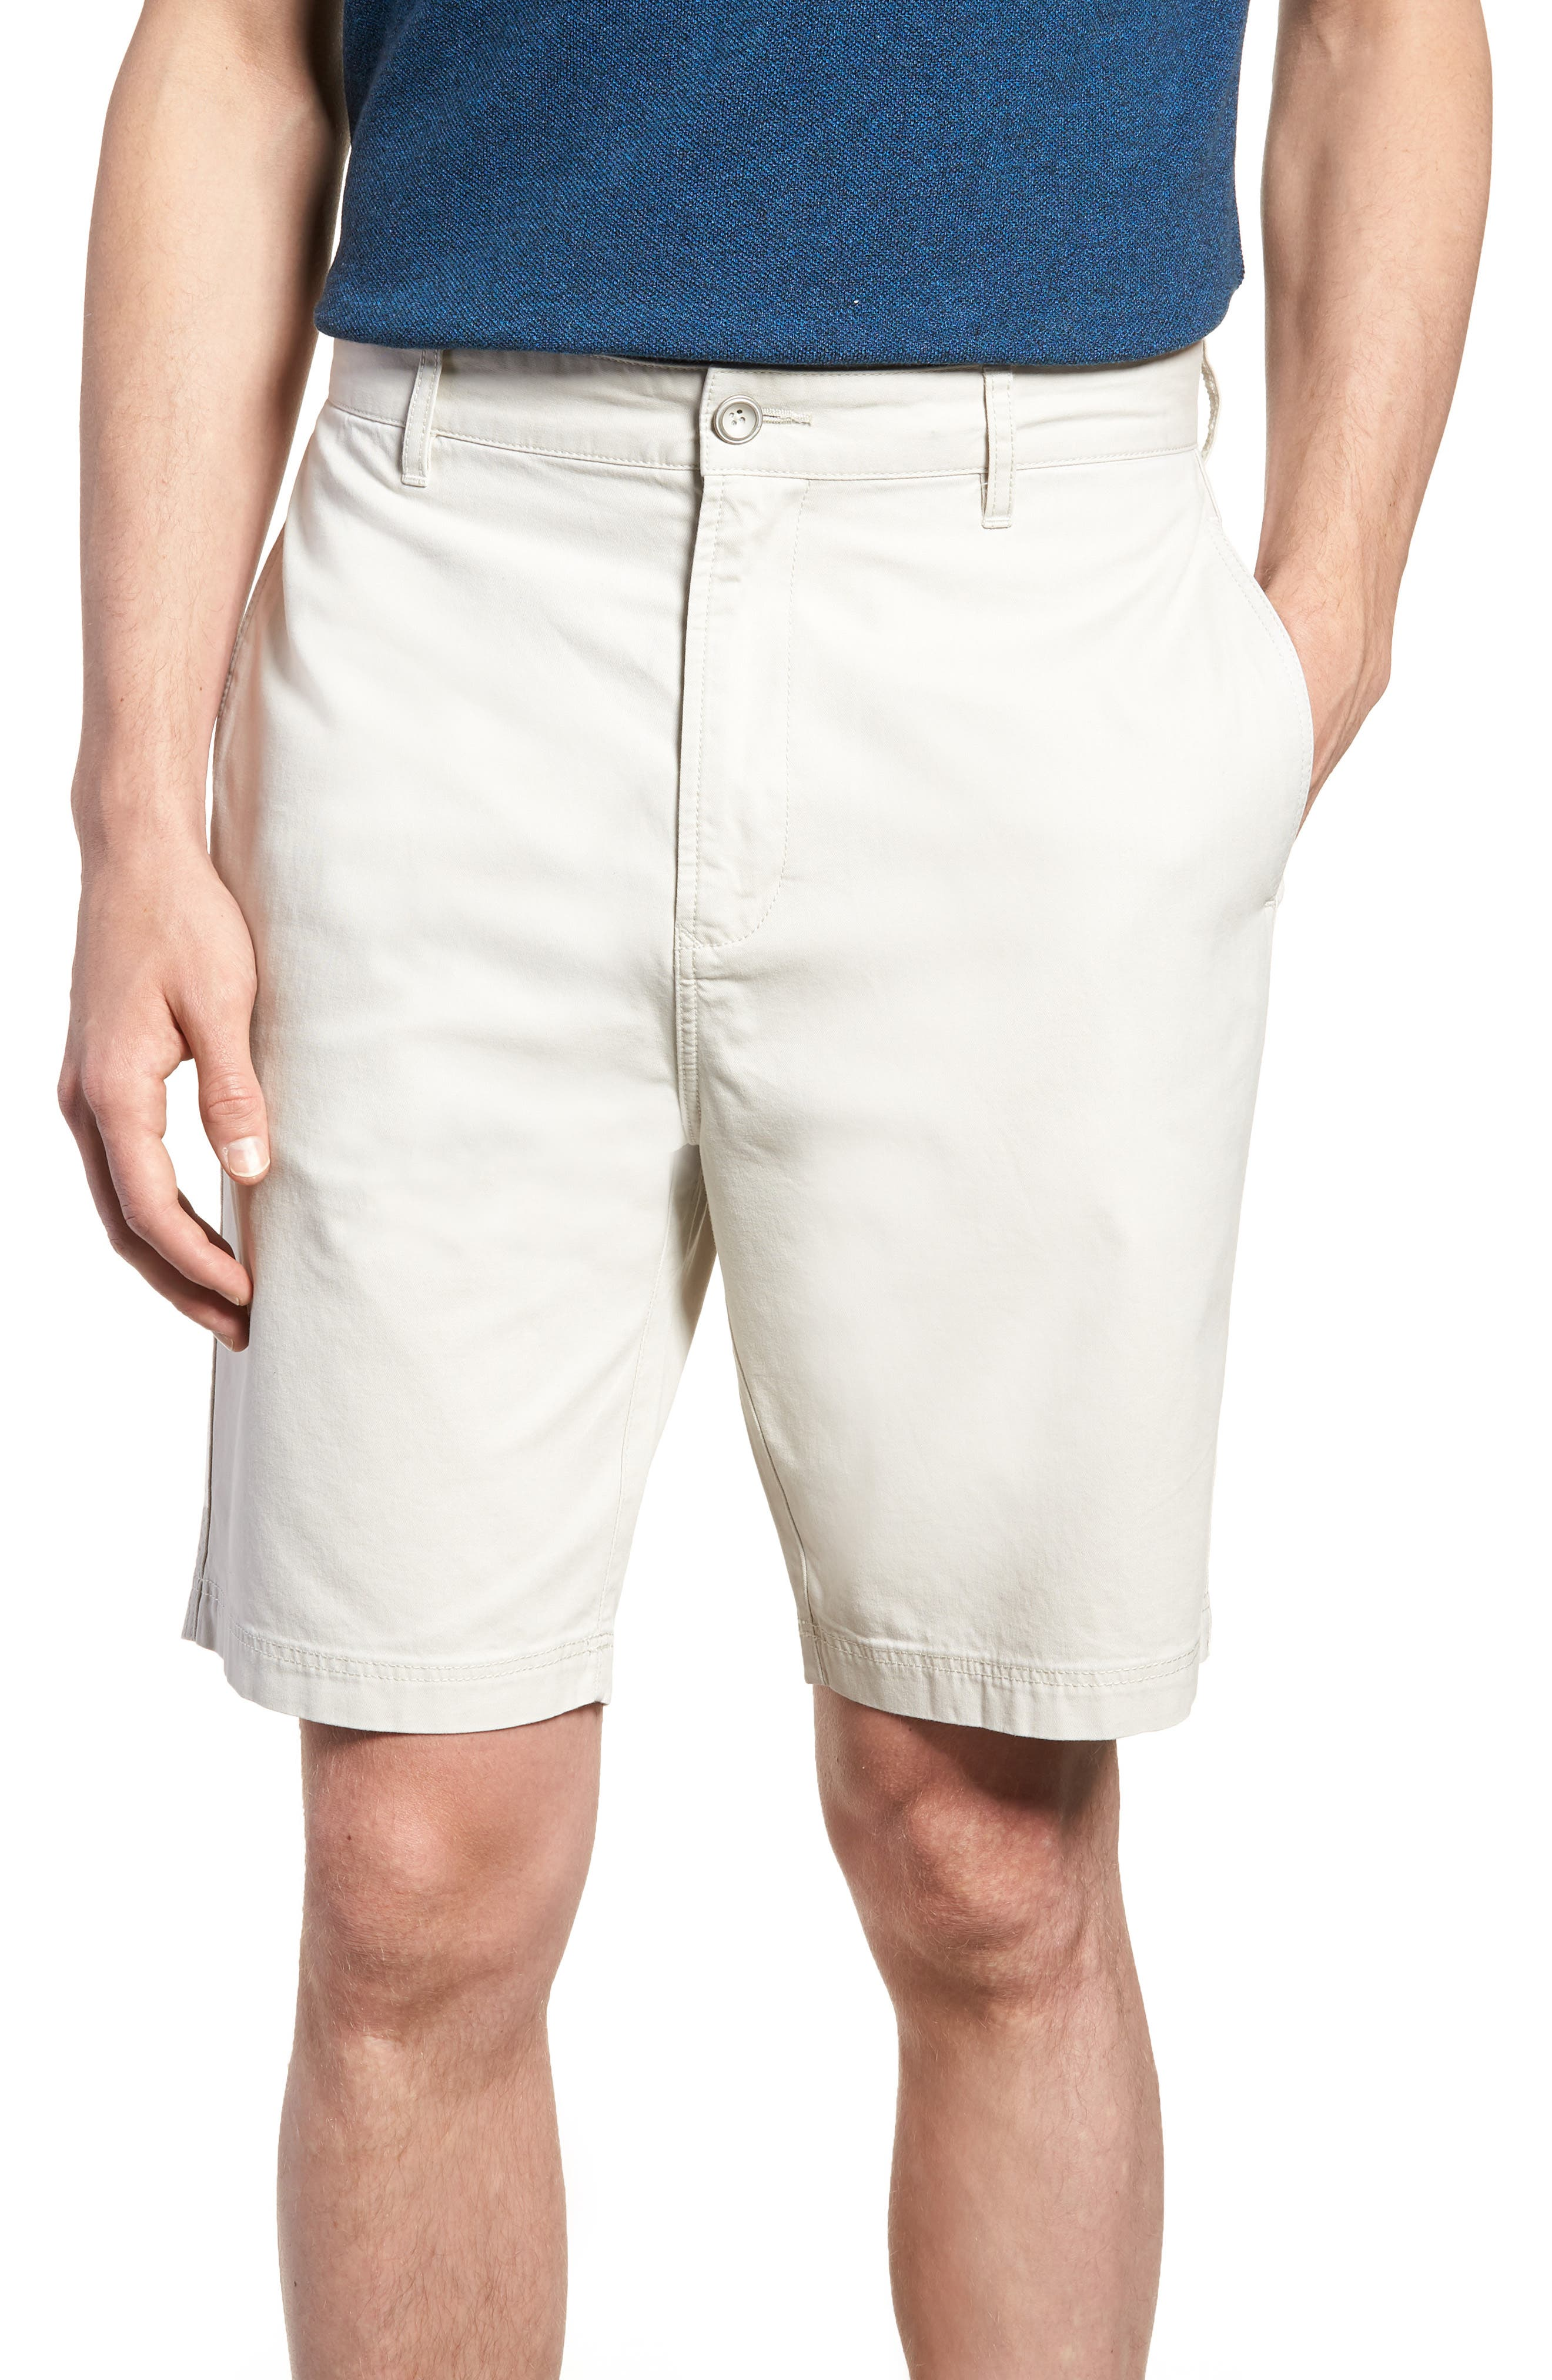 RODD & GUNN,                             Glenburn Shorts,                             Main thumbnail 1, color,                             261